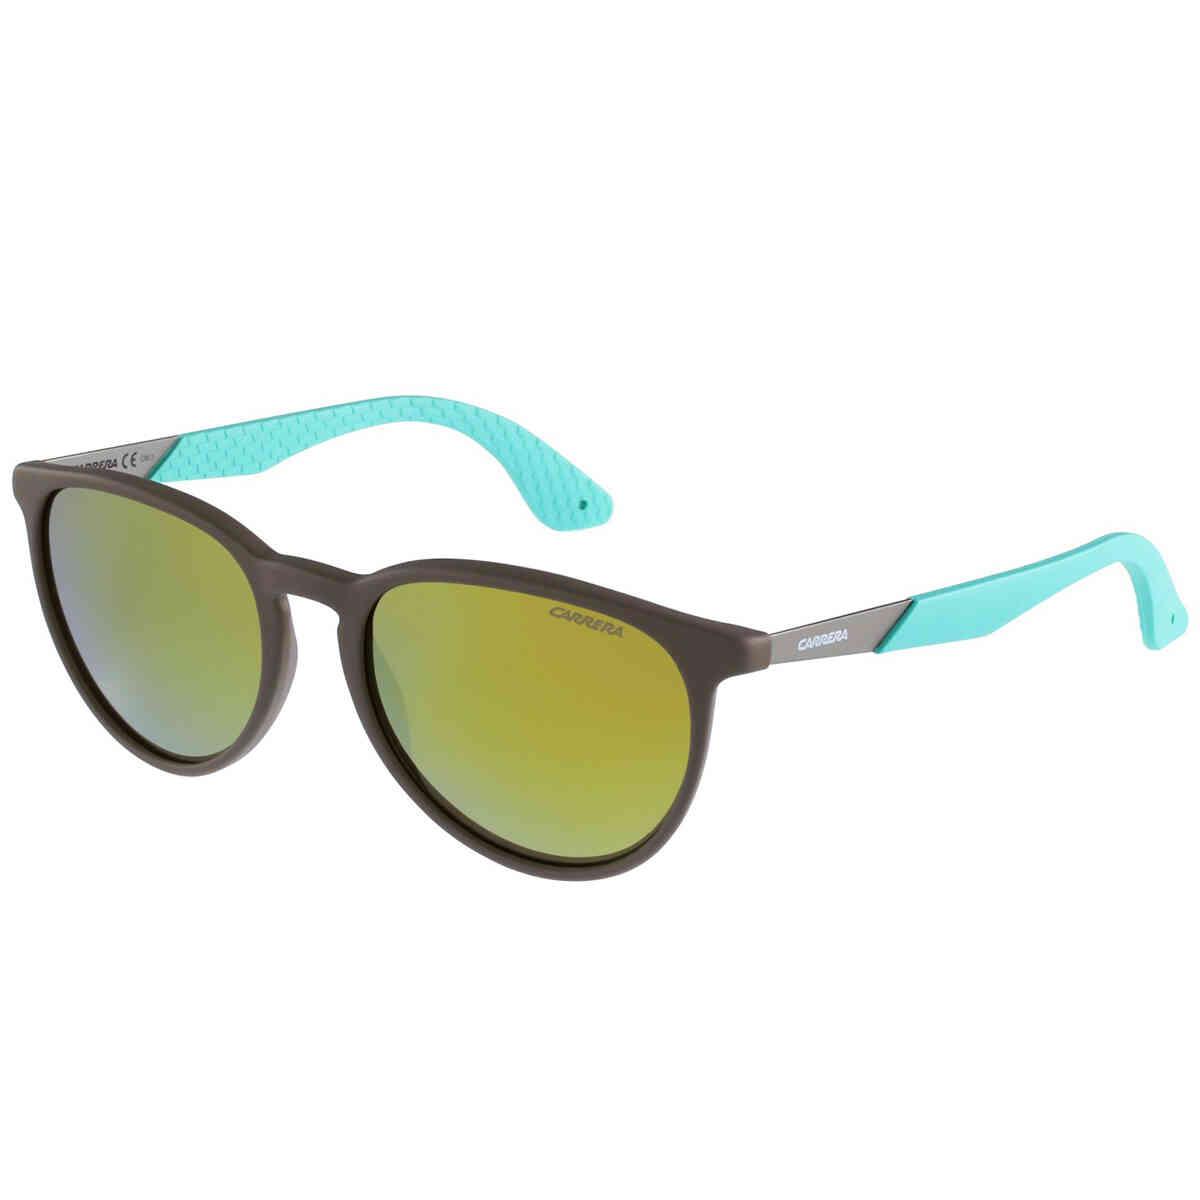 Óculos de Sol Carrera Unissex Espelhado CARRERA5019/S